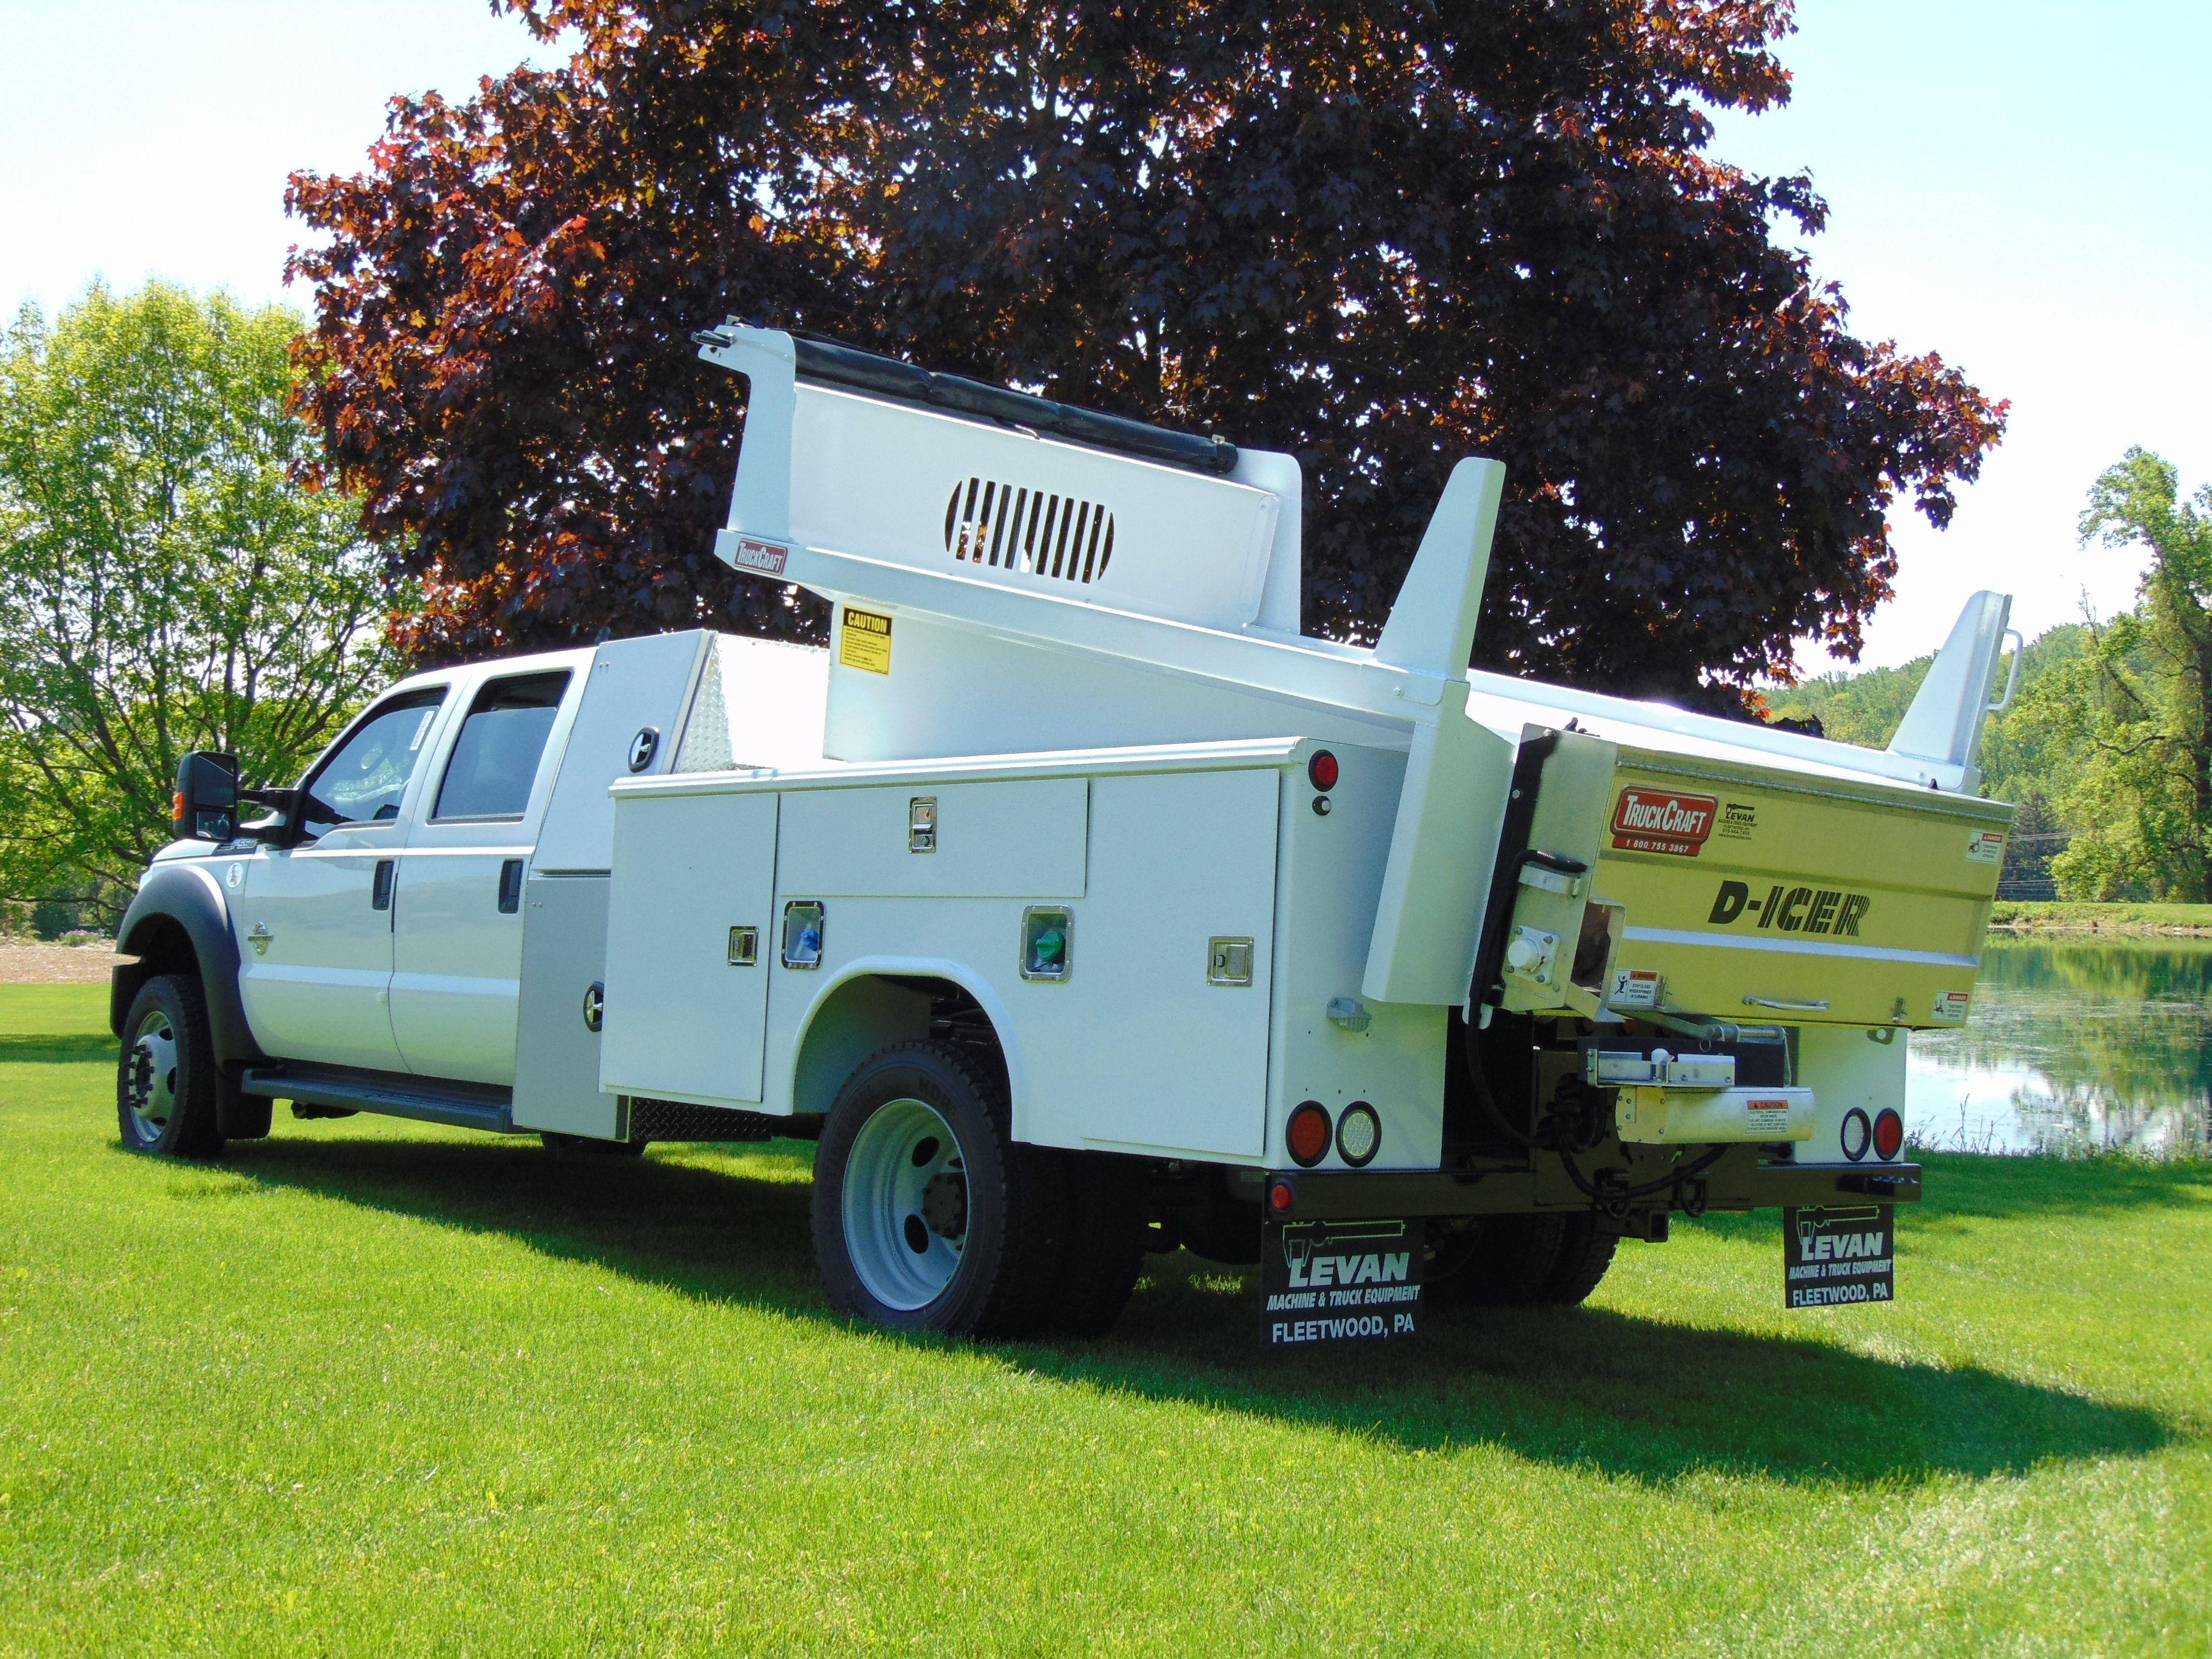 Combination Service Dump Bodies Products Truckcraft Corporation Chambersburg Pa Ford Work Trucks Dump Body Work Truck